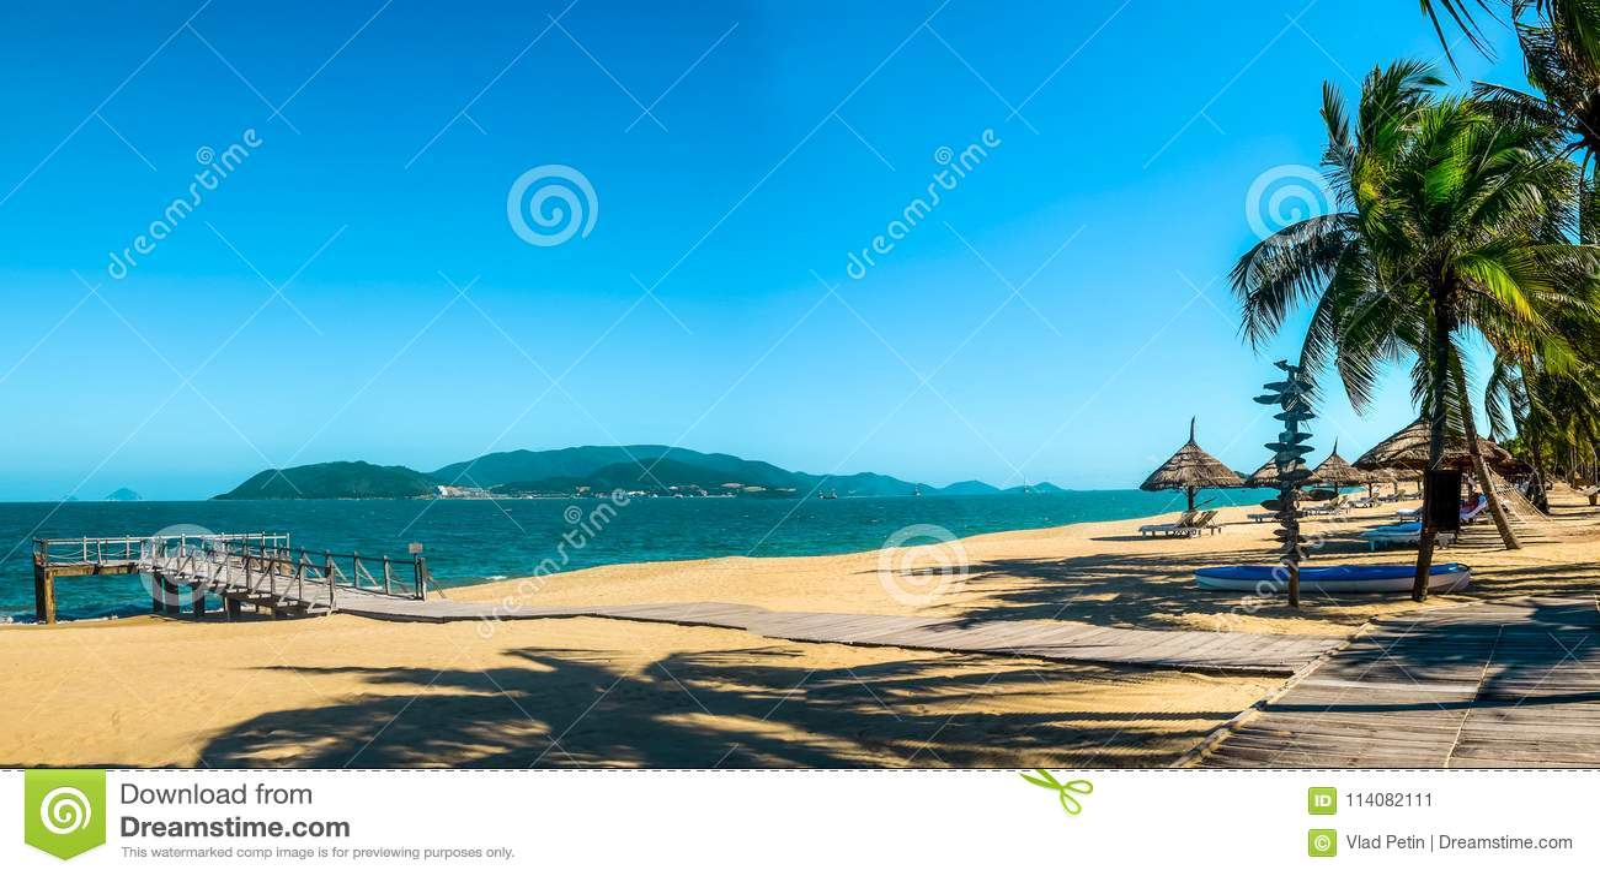 Paradise Beach On Tropical Island Stock Image